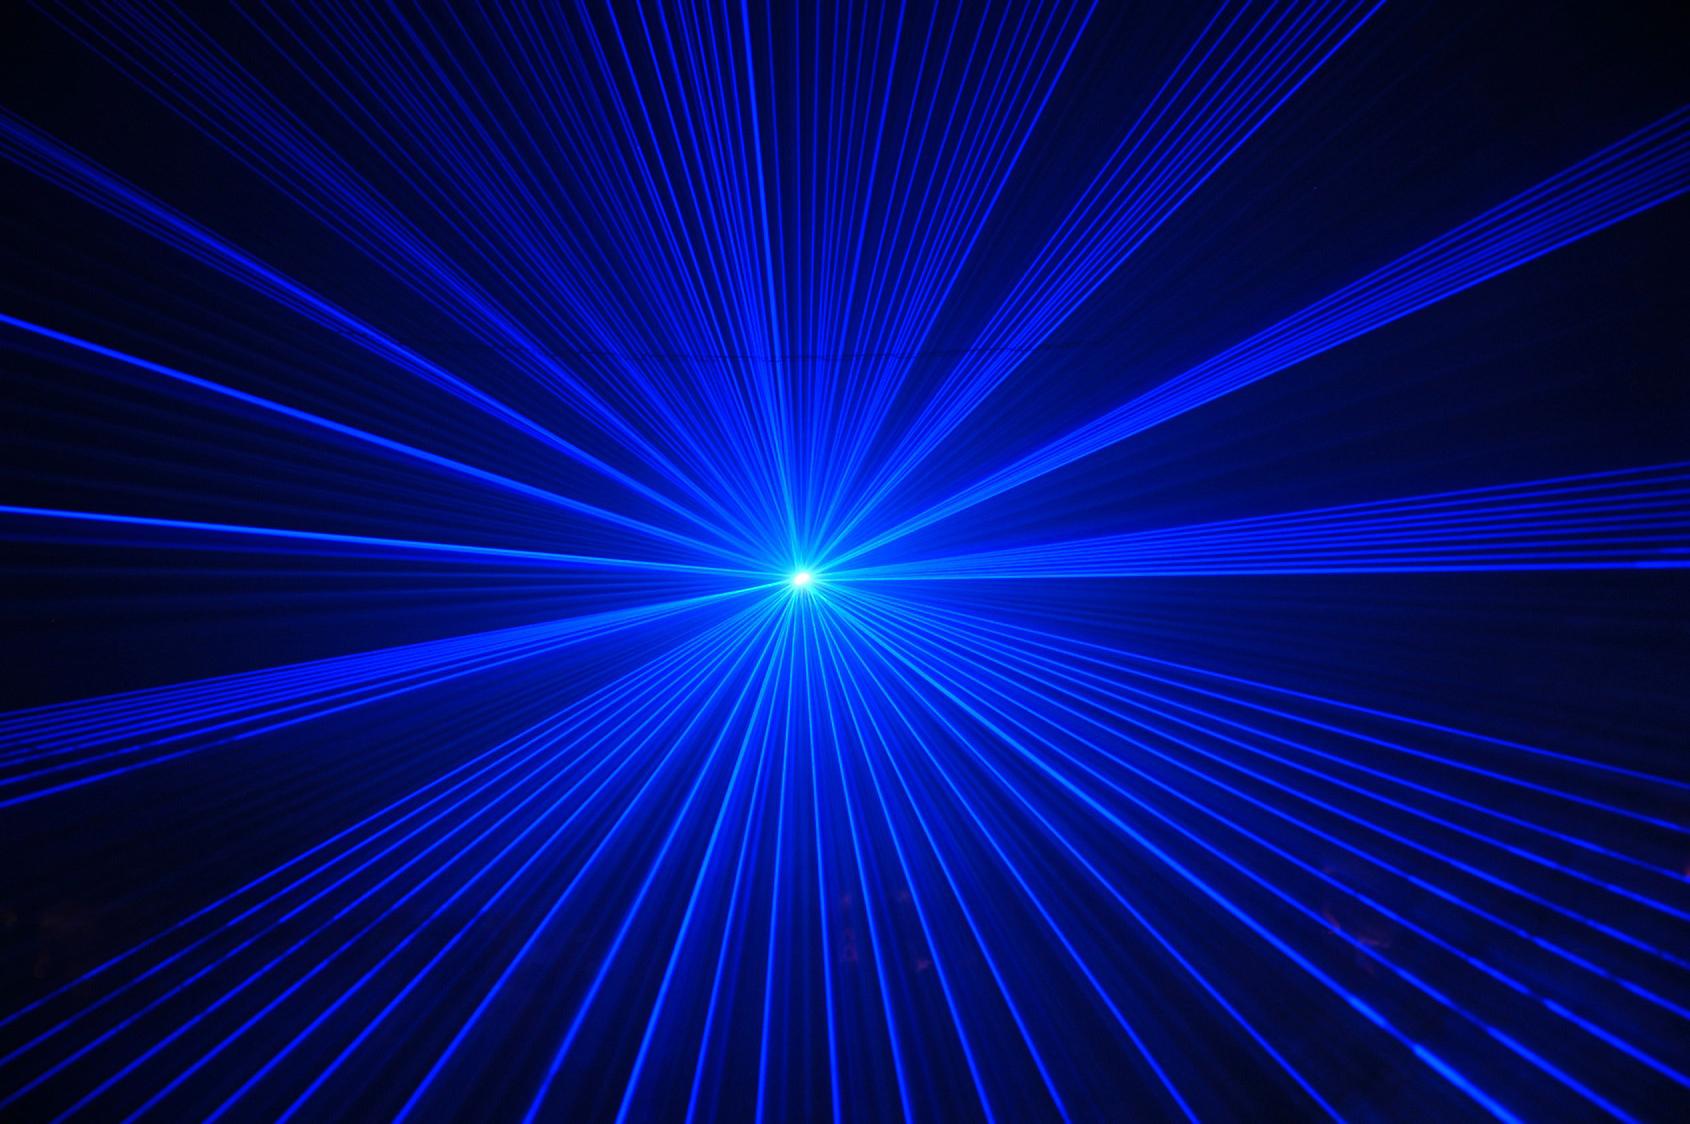 Images of Laser | 1690x1124